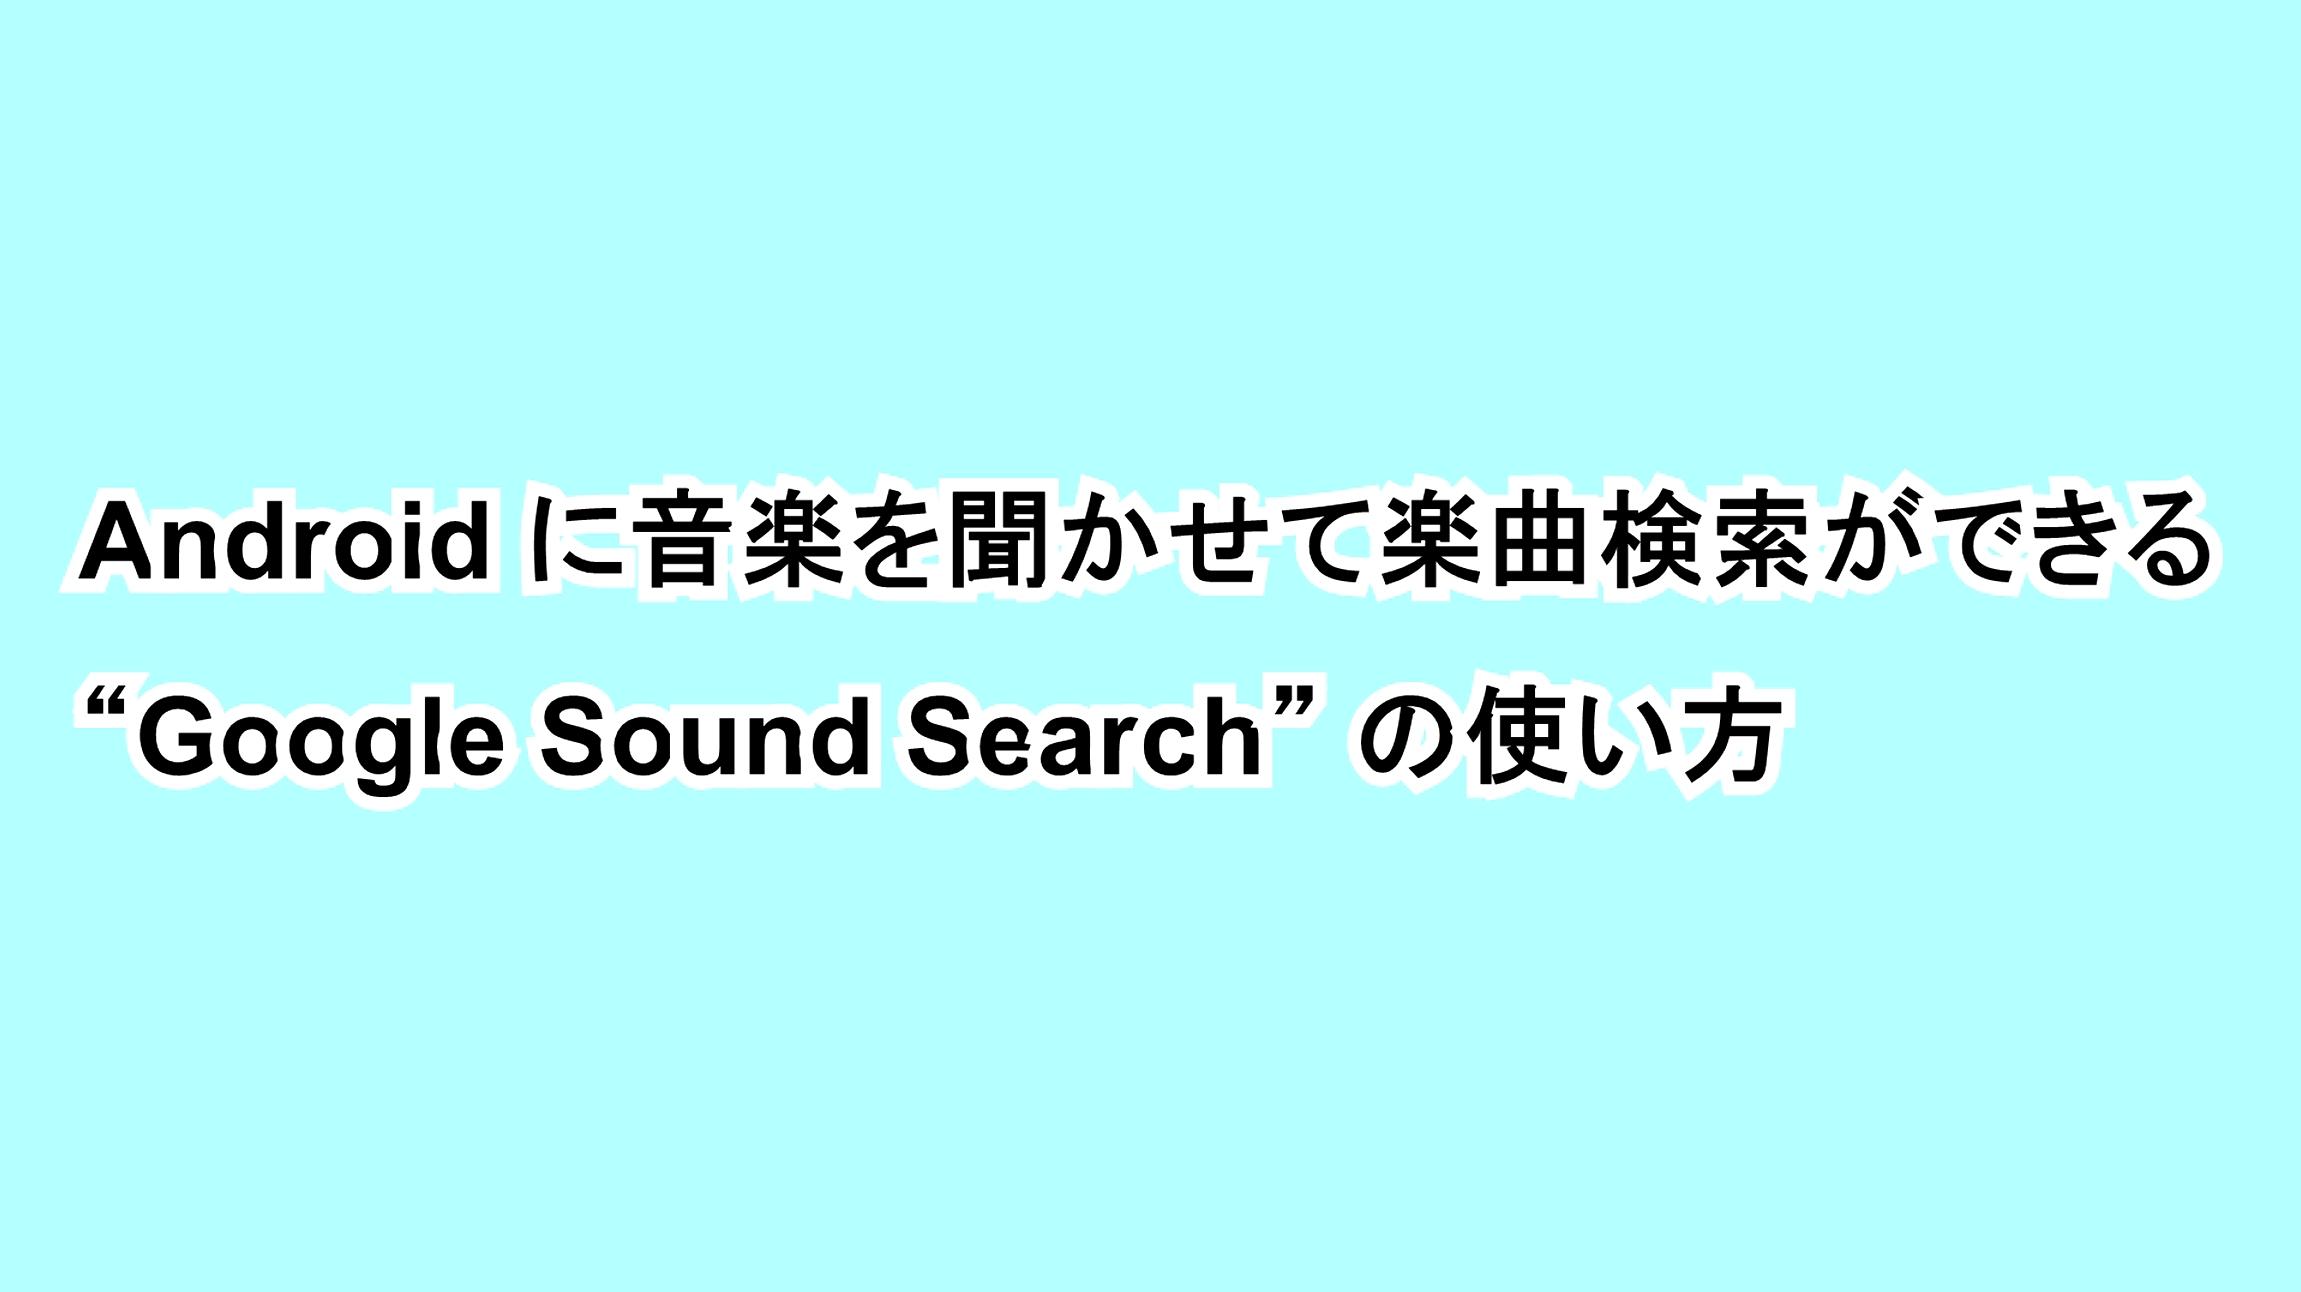 "Androidに音楽を聞かせて楽曲検索ができる""Google Sound Search""の使い方"